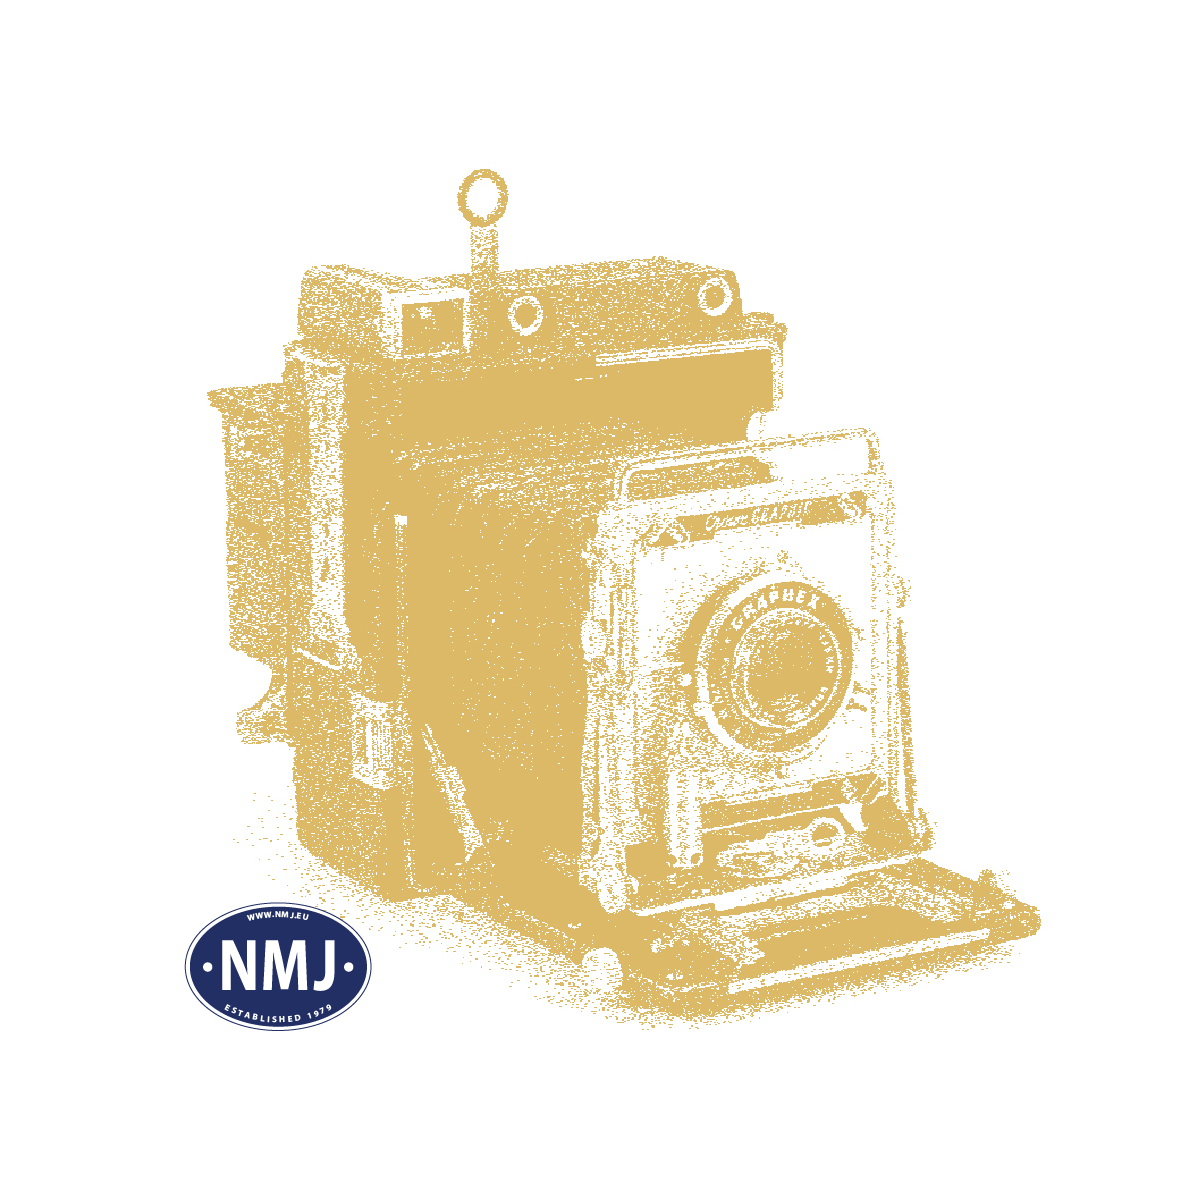 NMJT85.201AC - NMJ Topline CargoNet Di8.702, AC